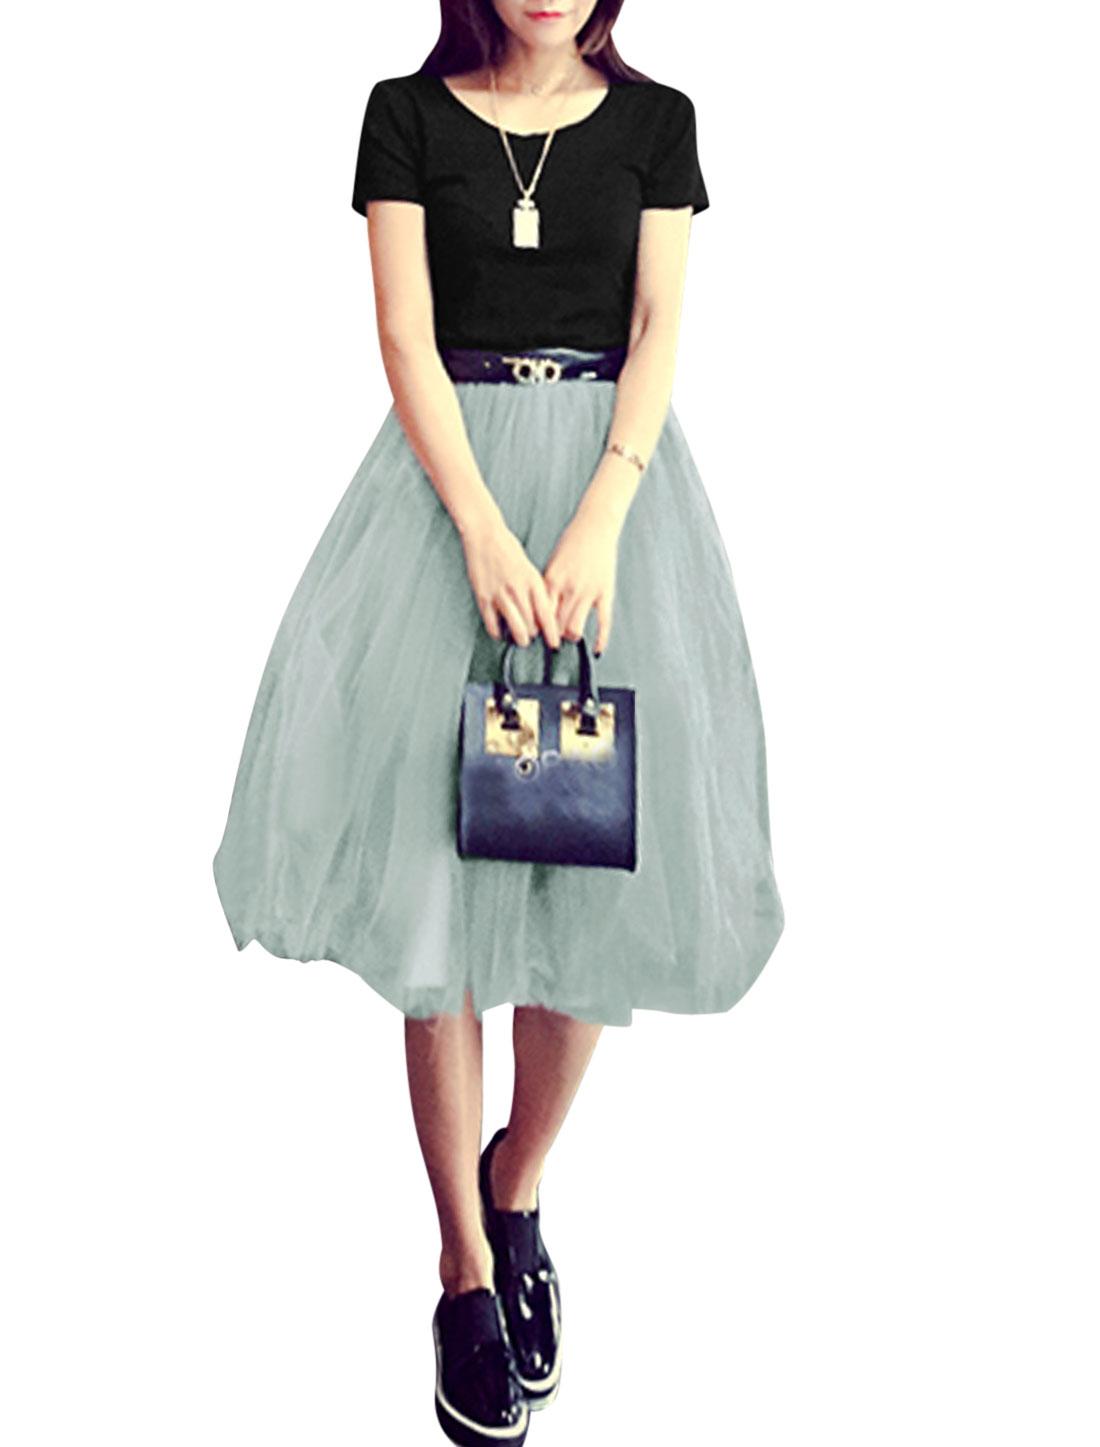 Women Short Sleeves T-Shirts w Elastic Waist Full Lined Mesh Skirts Black Gray M